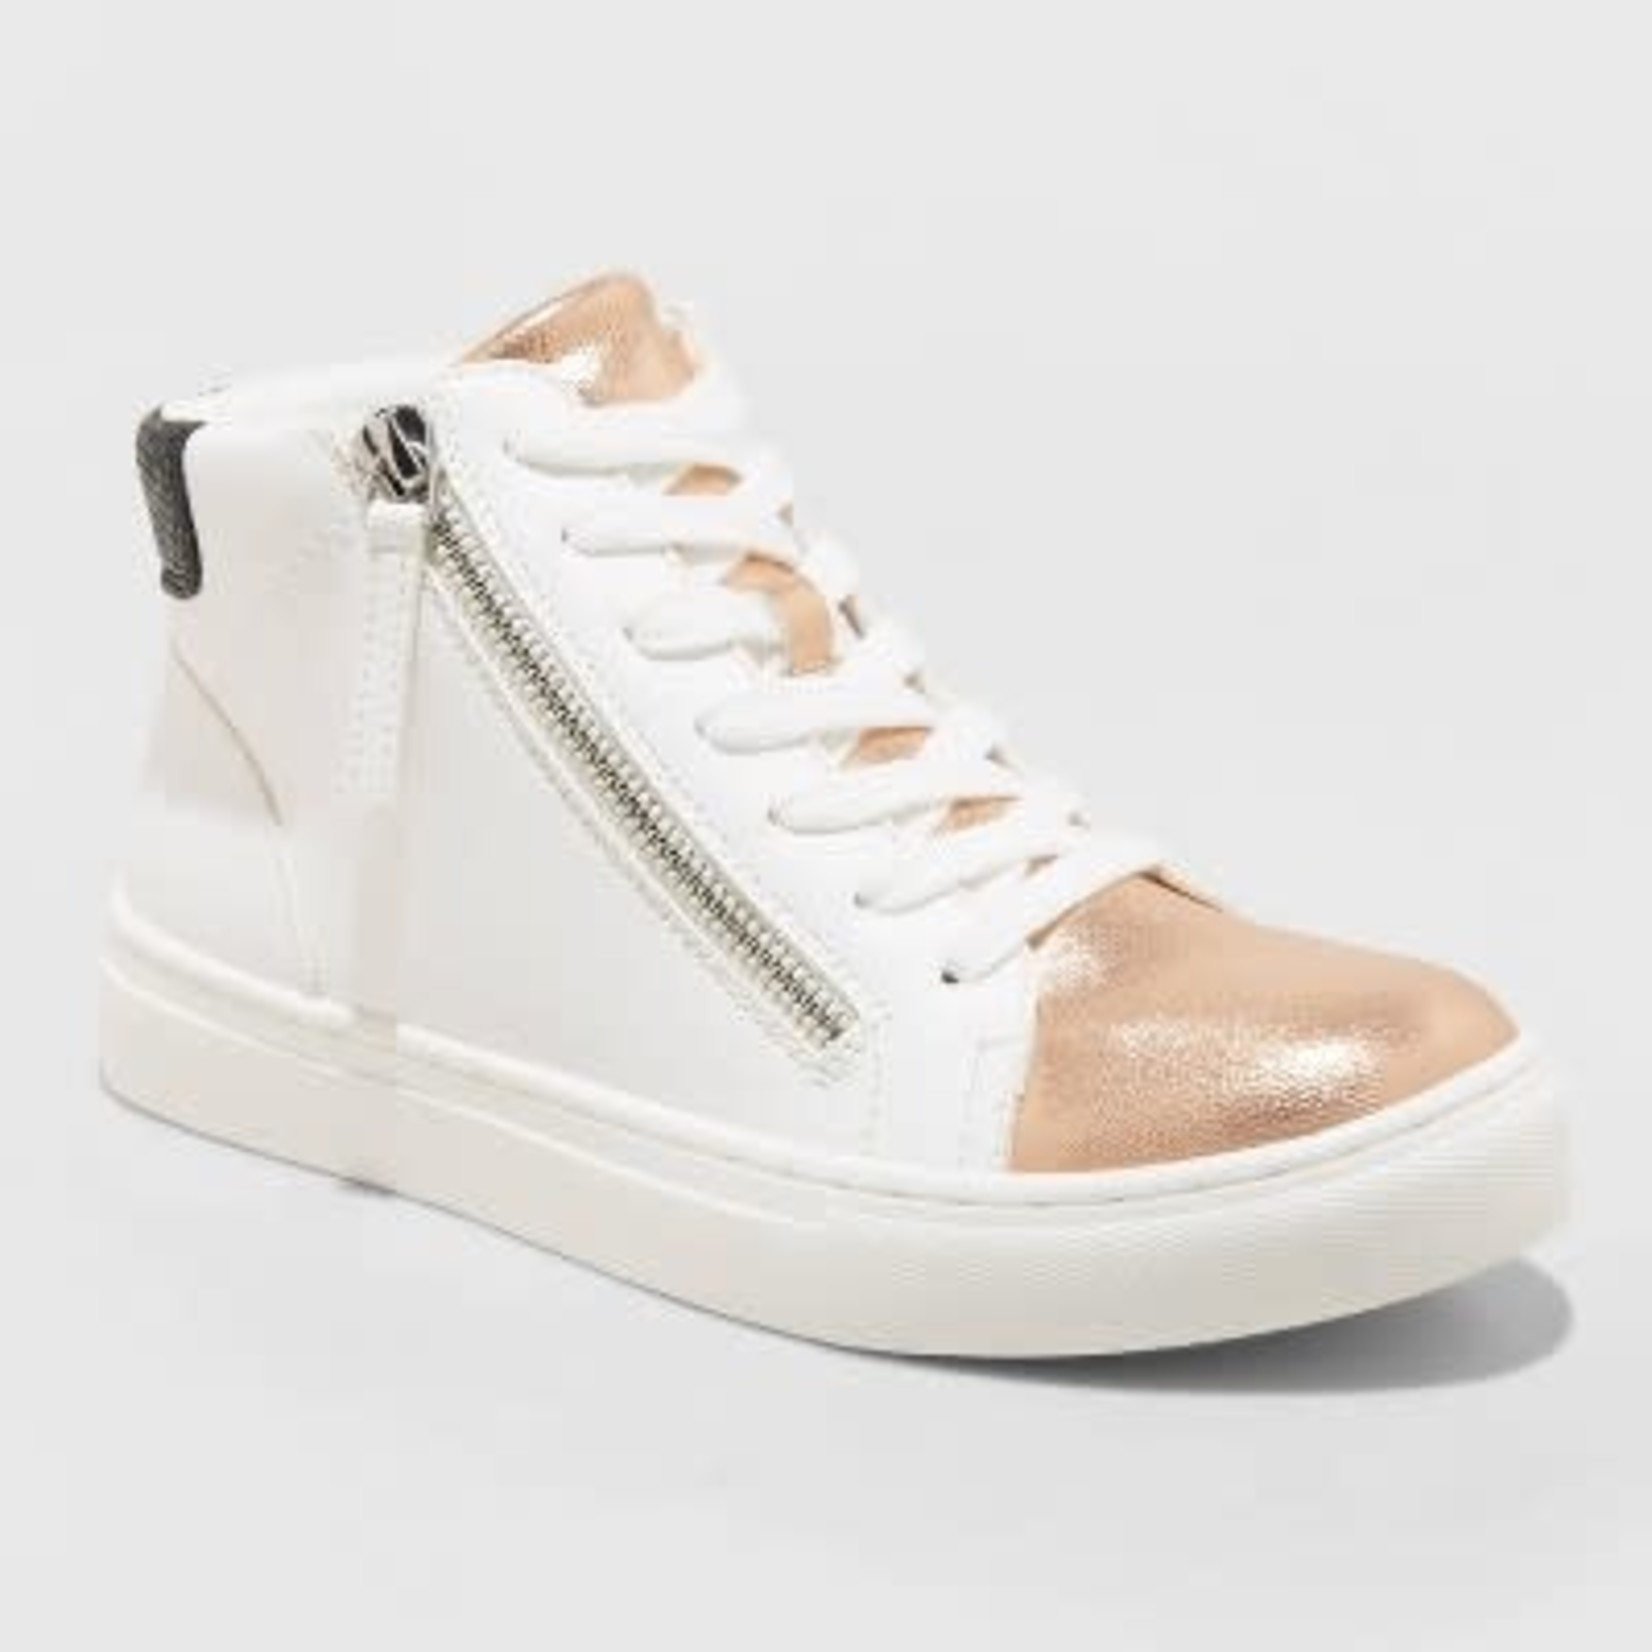 Women's Brooklin High Top Sneakers - Universal Thread  -8.5